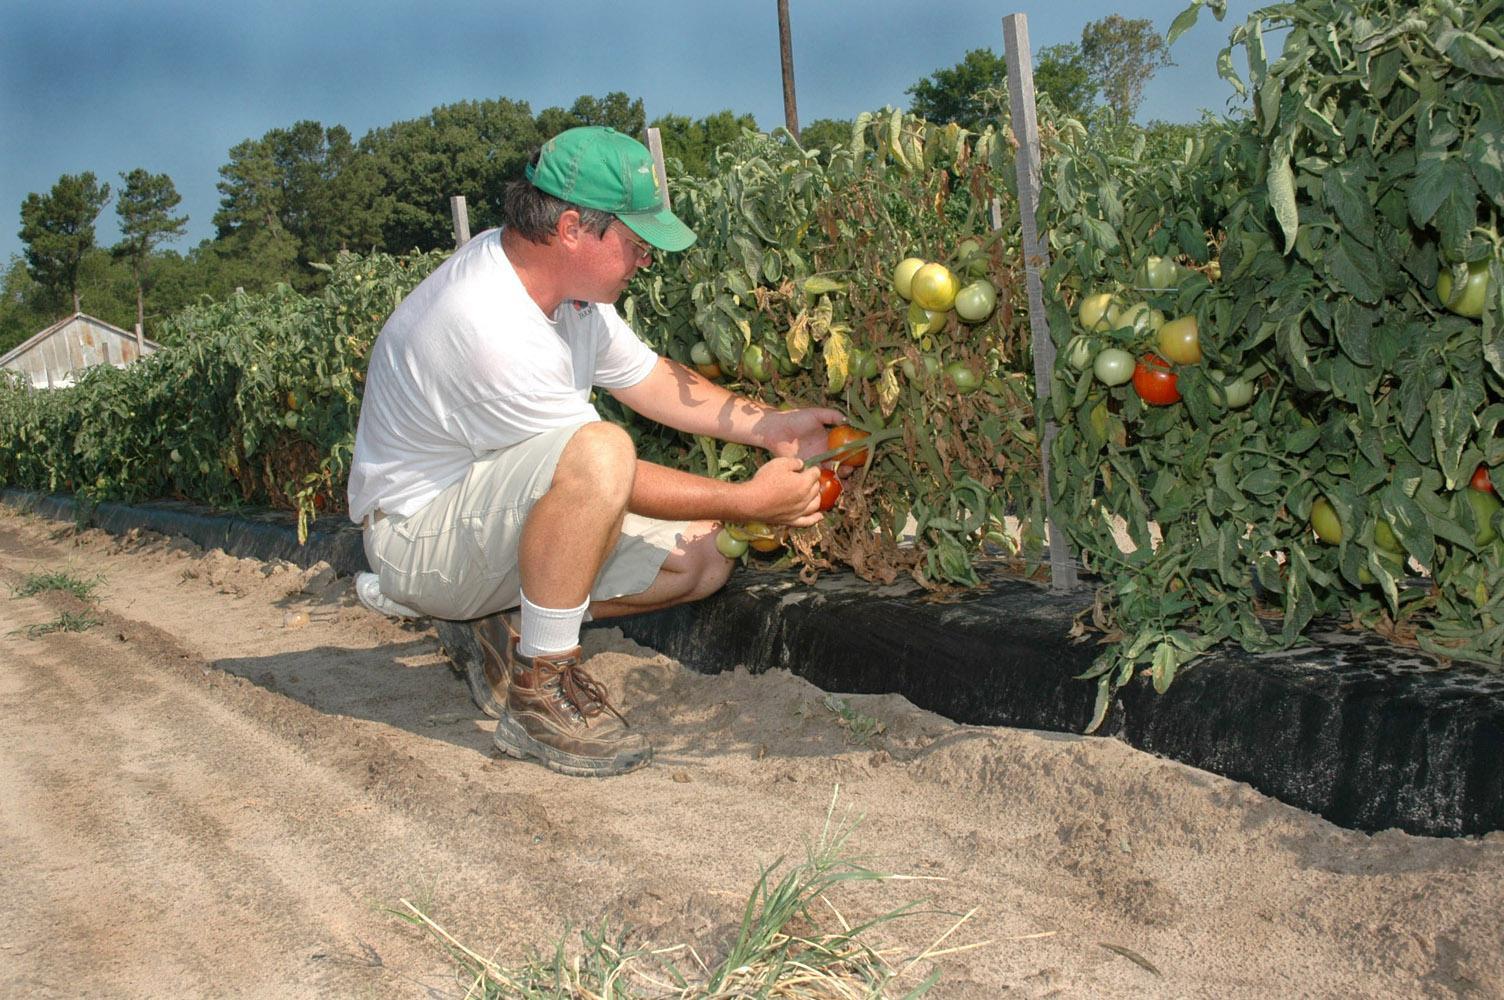 Mel Ellis picks some of his vine-ripe tomatoes.